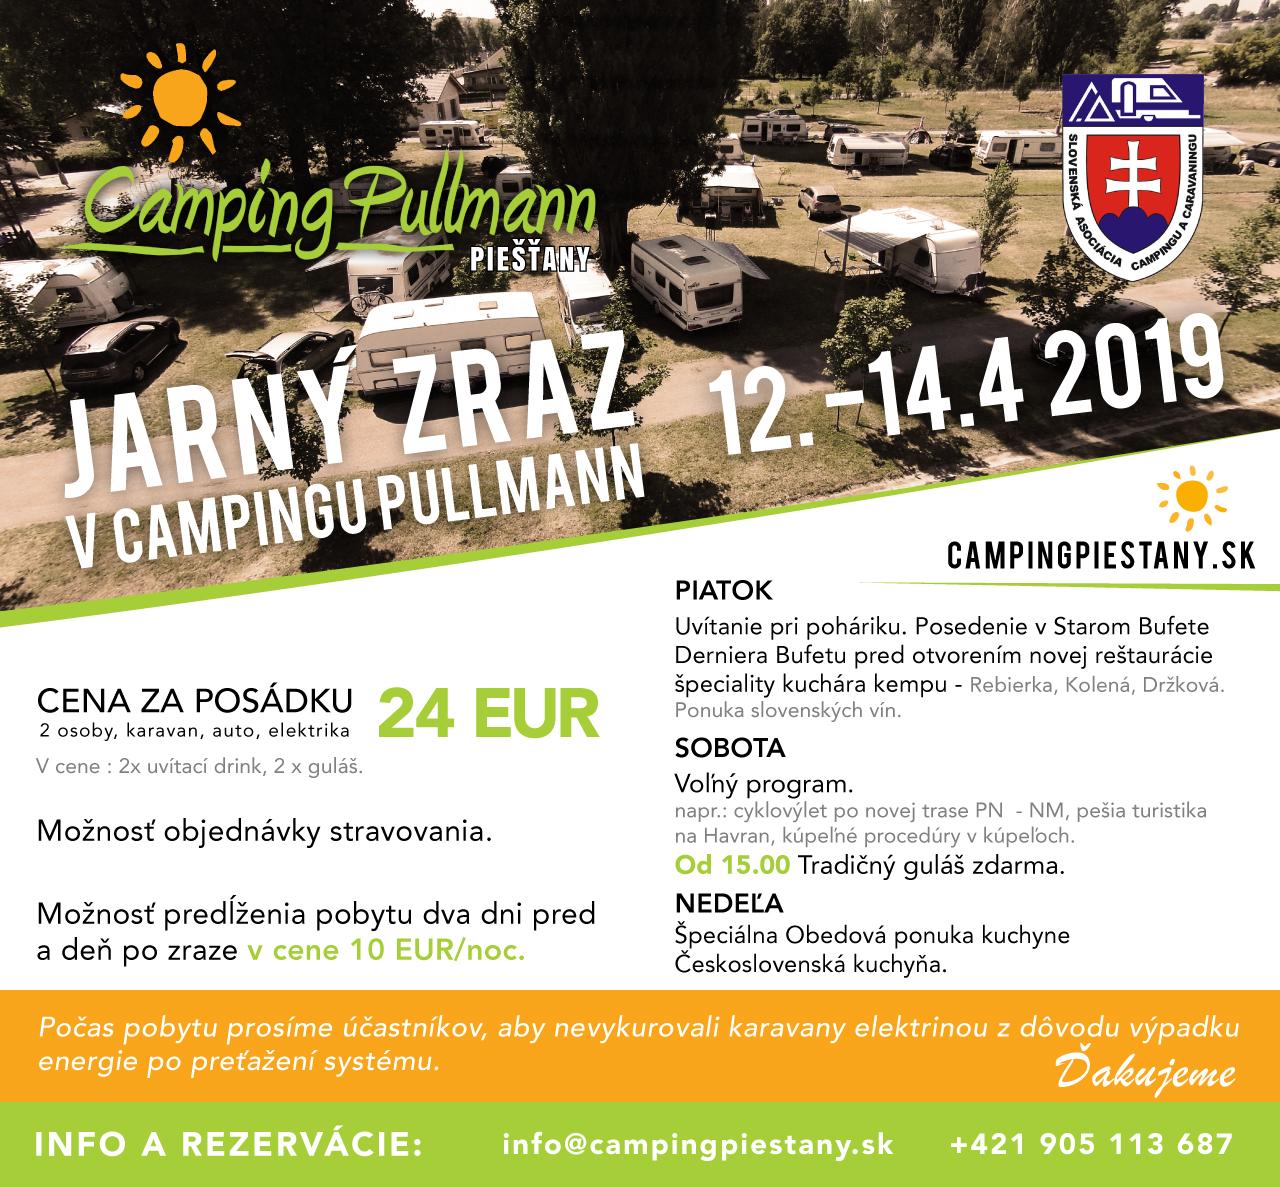 camp plagat_jarny_zraz19